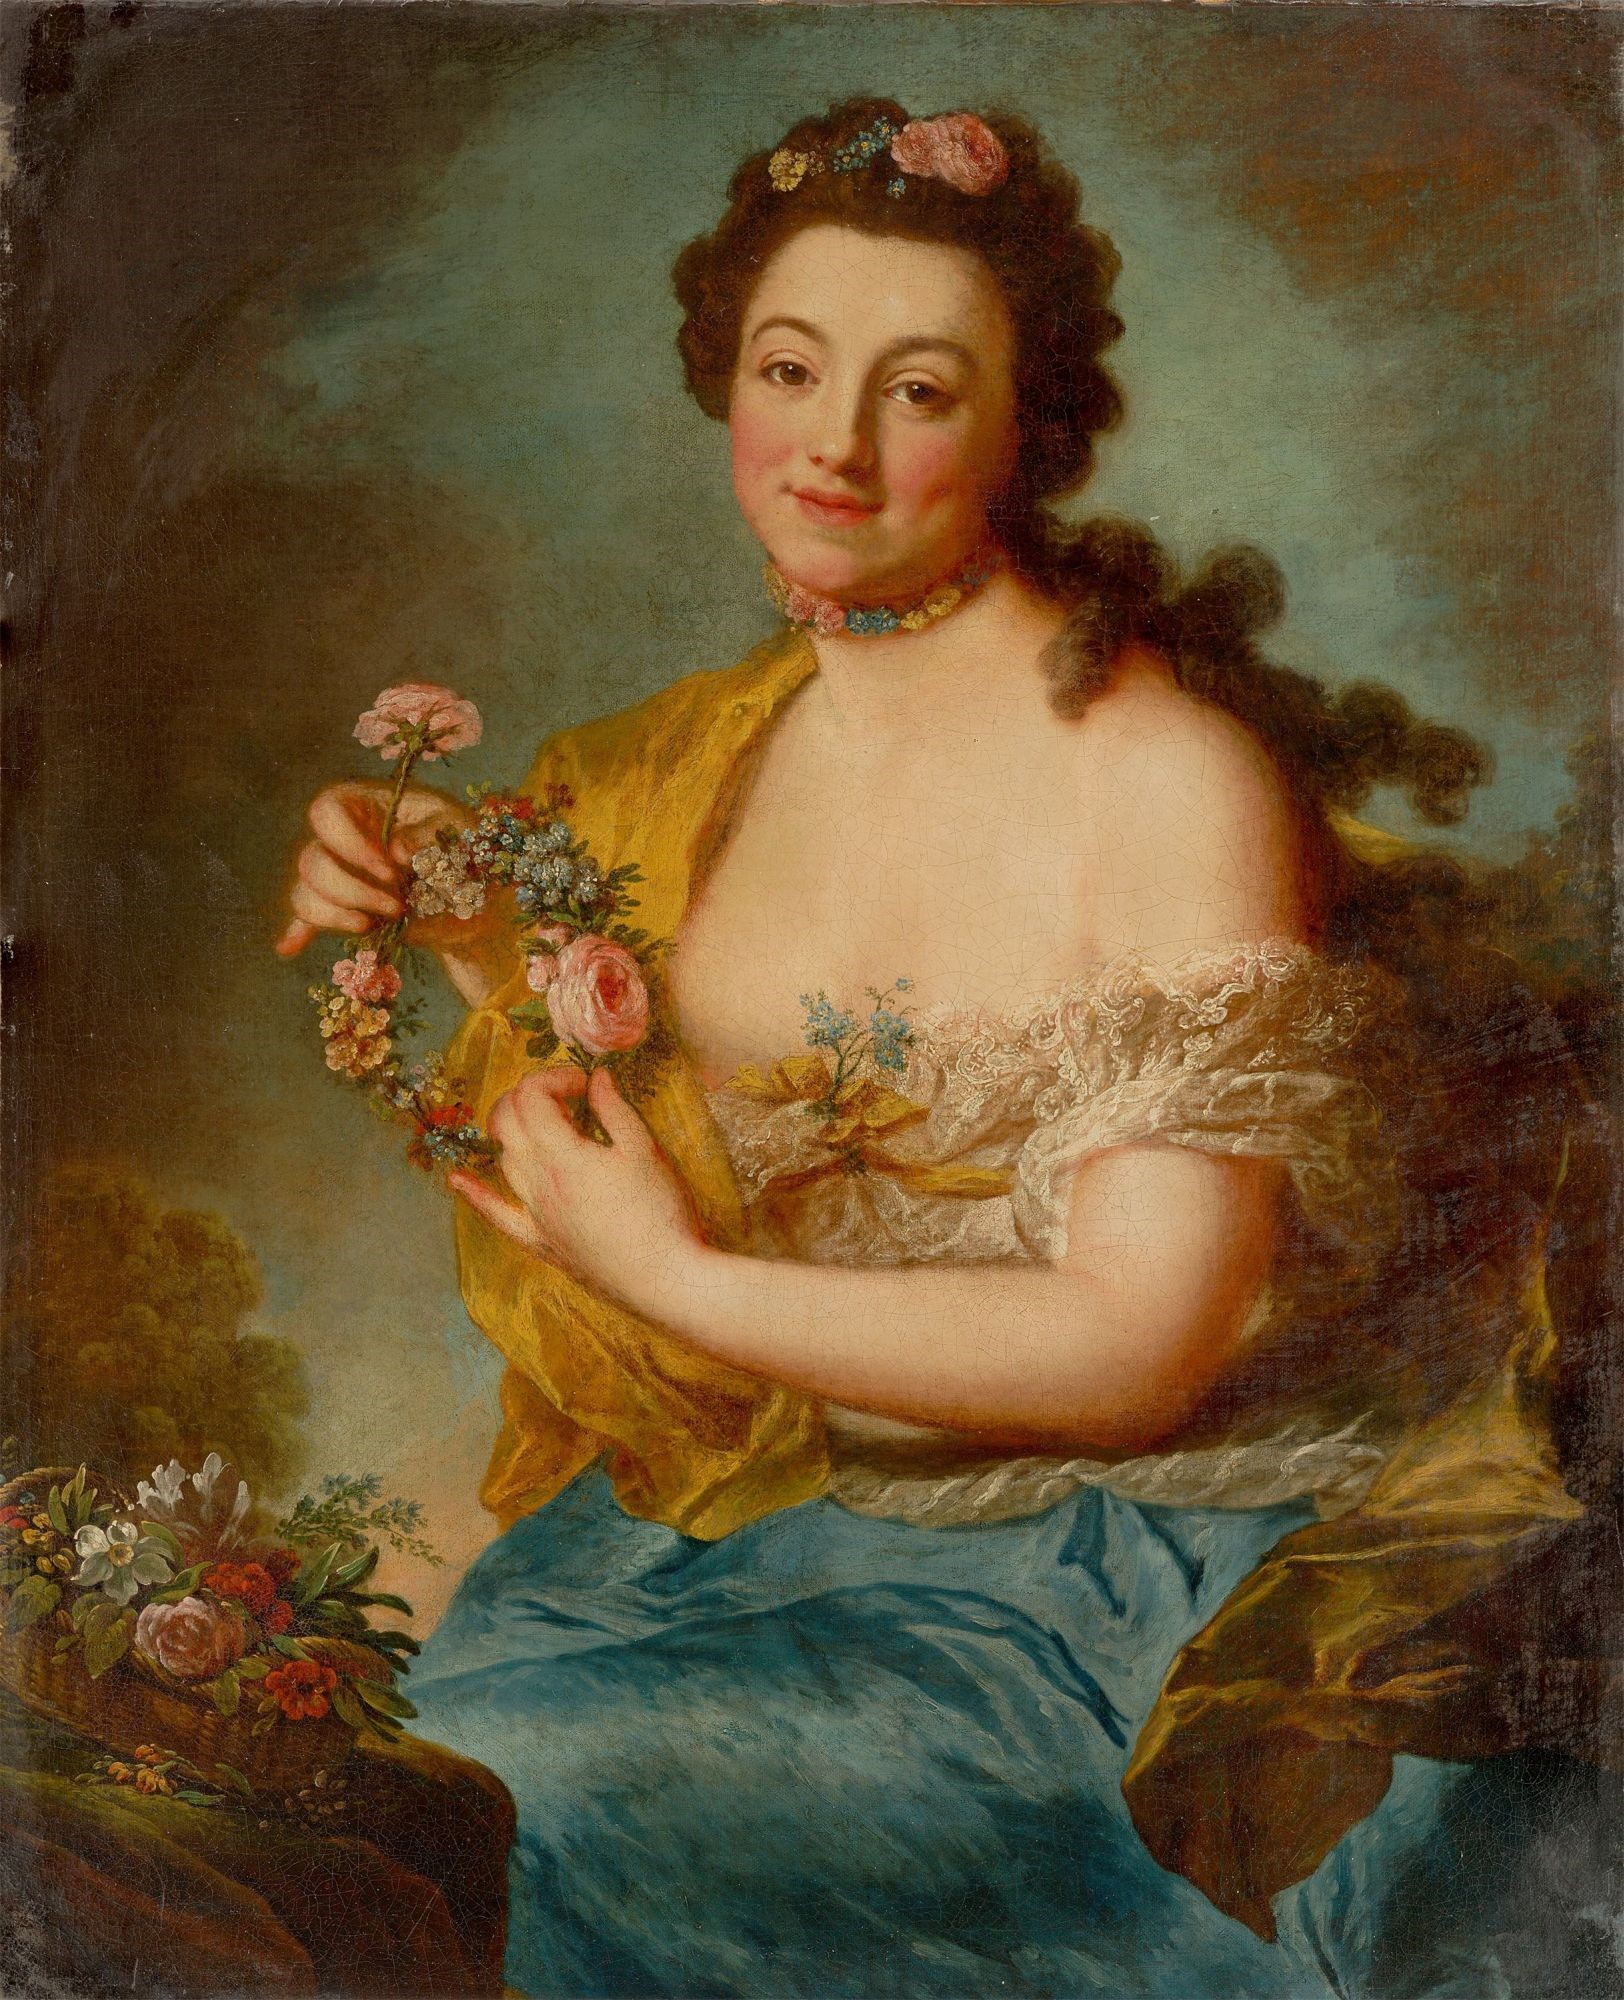 Selbstbildnis als Flora, 1765/68, Öl auf Leinwand, 94,6 x 77 cm, Villa Grisebach  © Wikimedia Commons